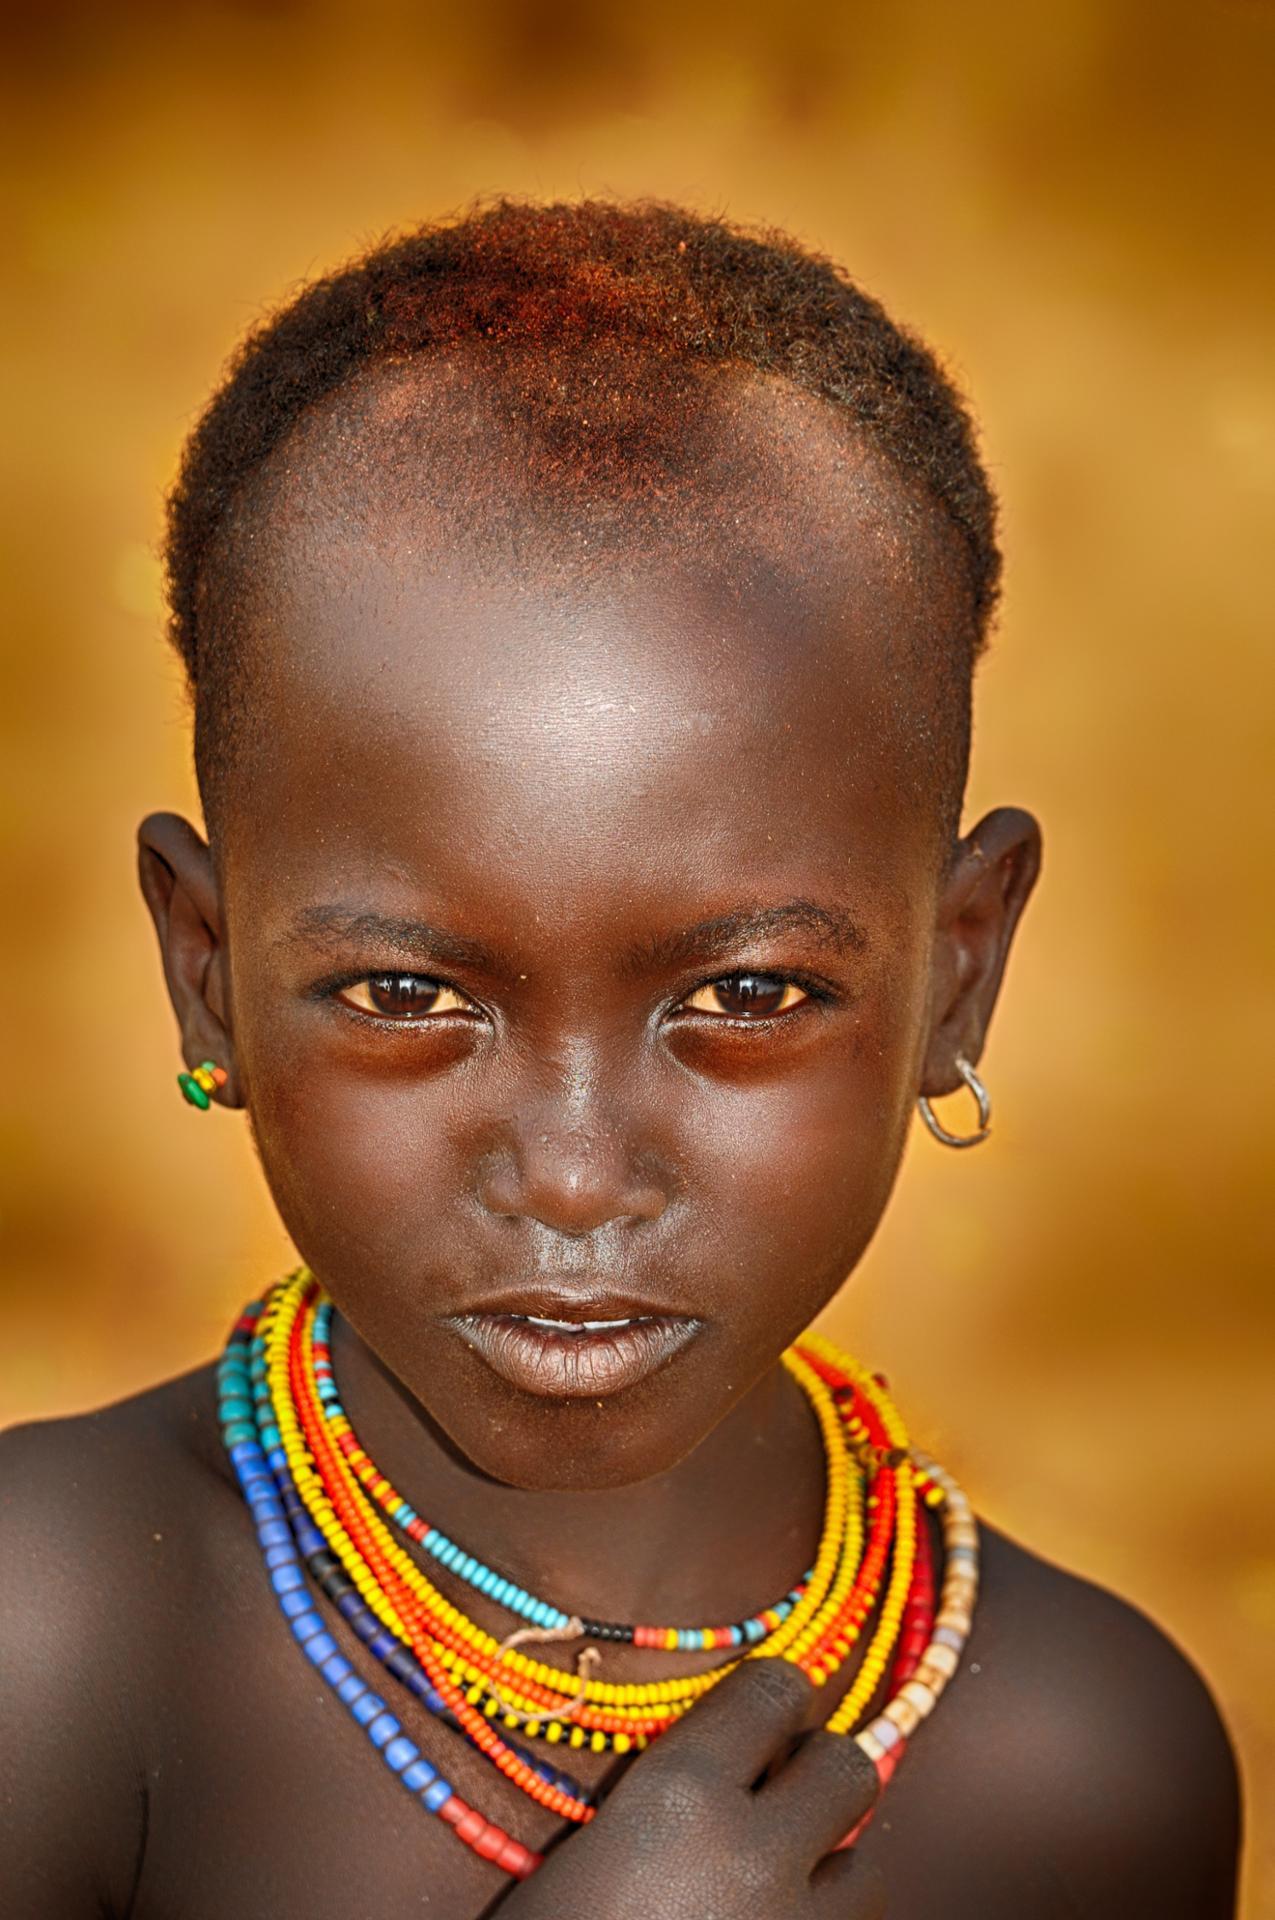 Fillette de la tribu Hamar (Vallée de l'Omo, Ethiopie)